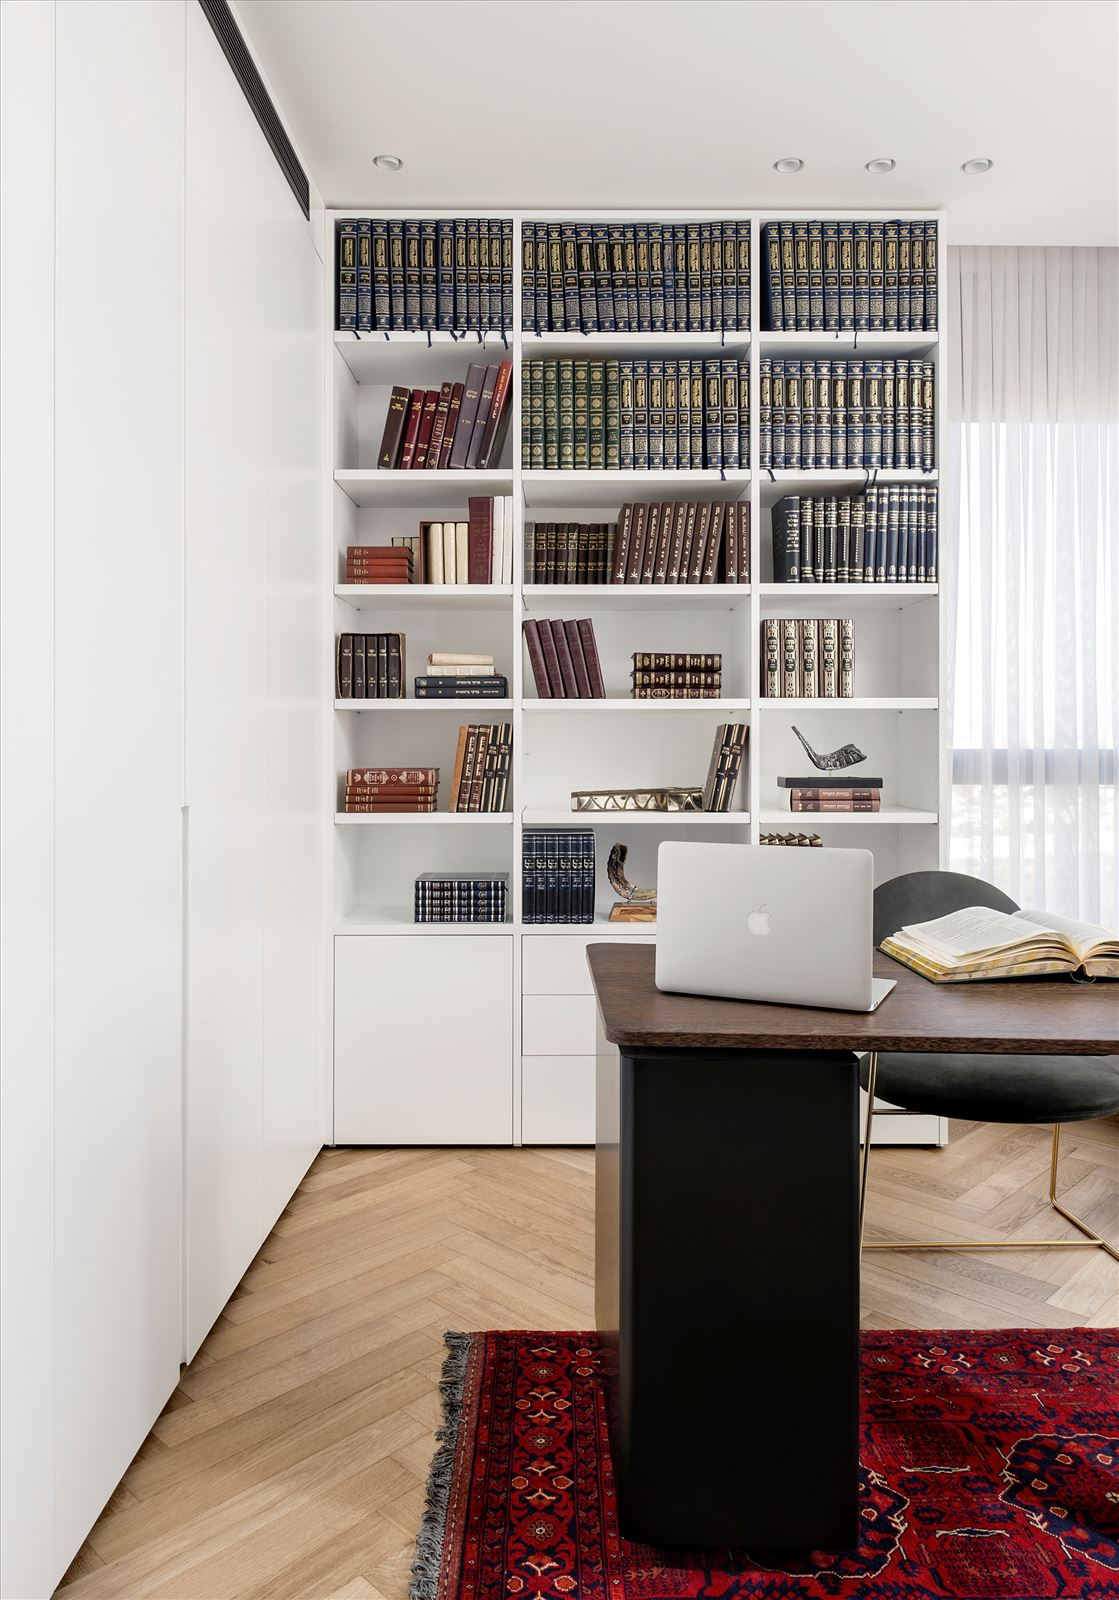 Penthouse - Petah Tikva גופי תאורה מאירים את הספרייה בחדר העבודה בתכנון דורי קמחי